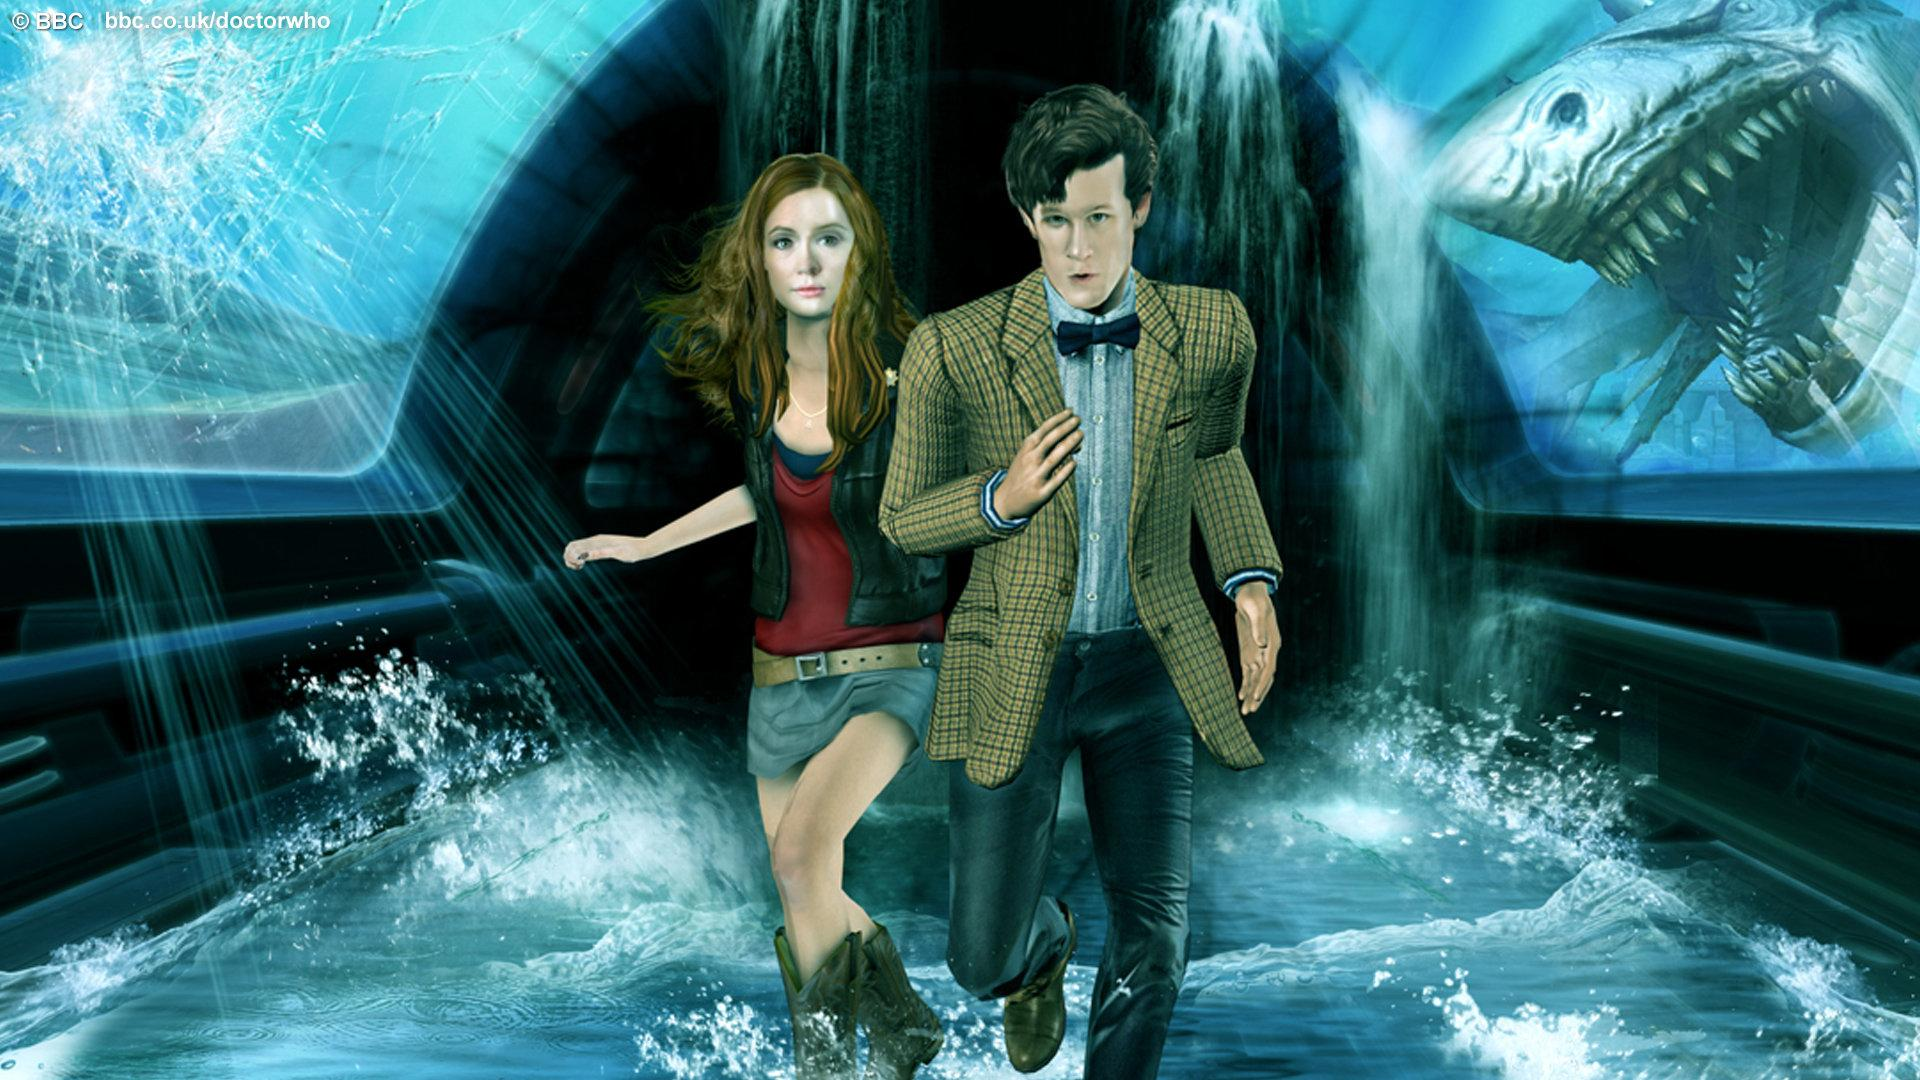 Doctor Who Staffel 5